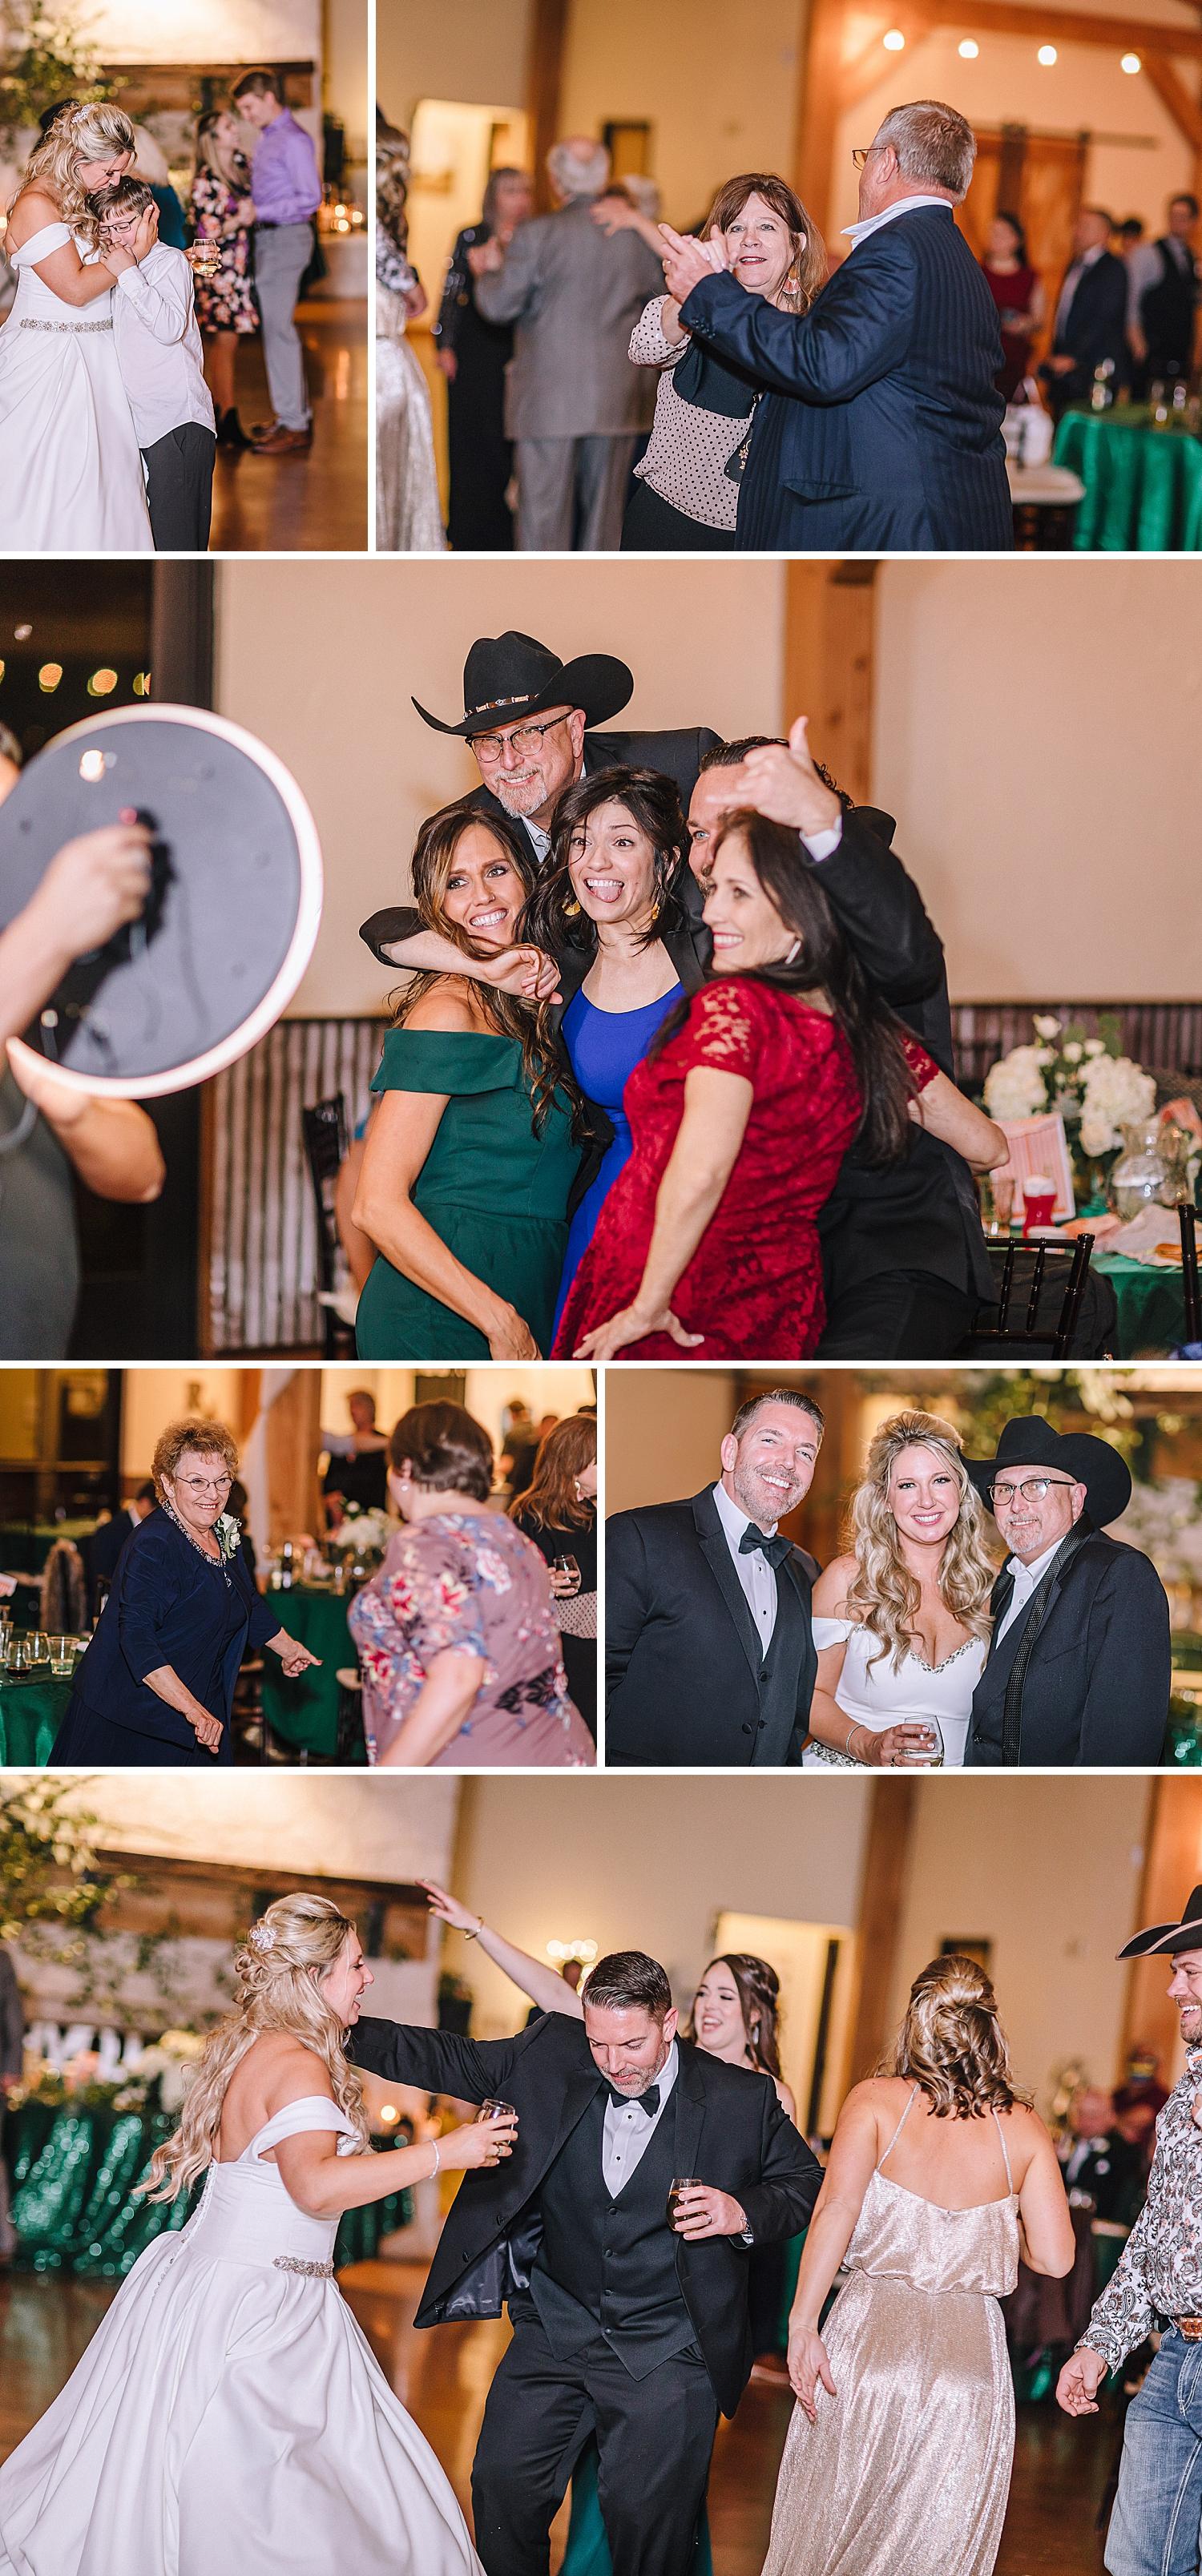 Magnolia-Halle-Wedding-San-Antonio-Texas-Bride-Grom_0103.jpg